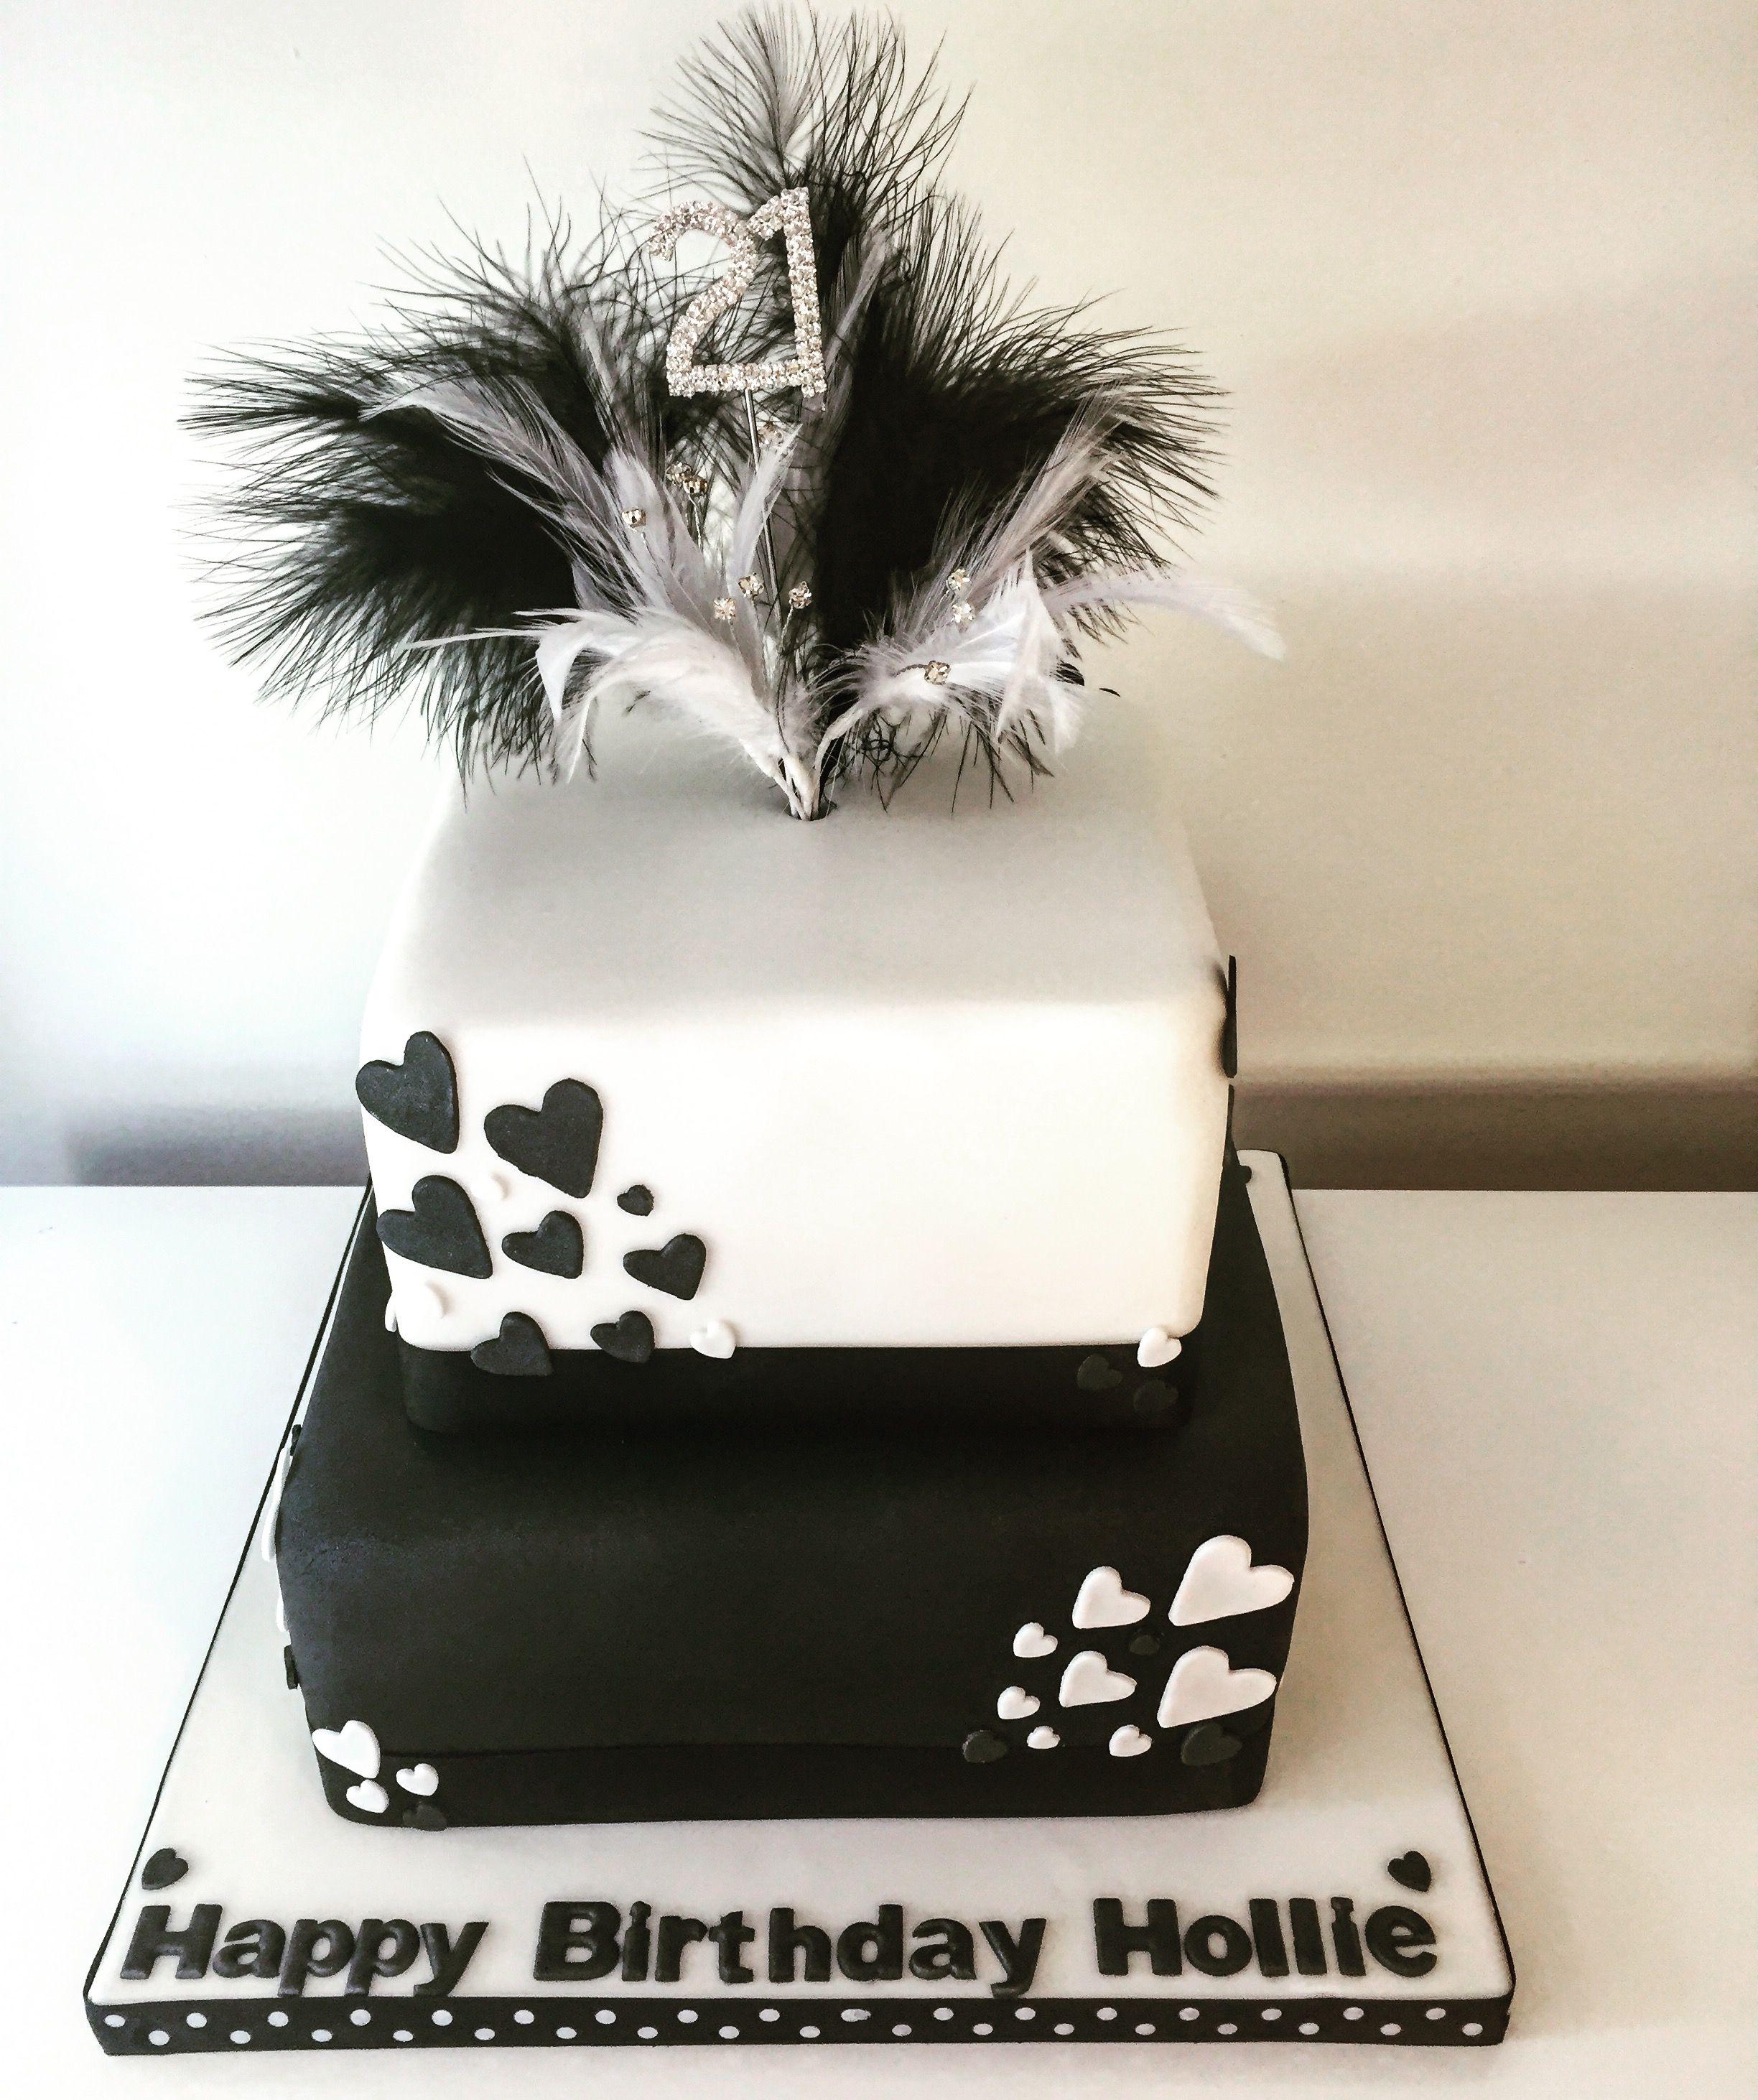 Two Tiered Square 21st Birthday Cake 21st Birthday Pinterest